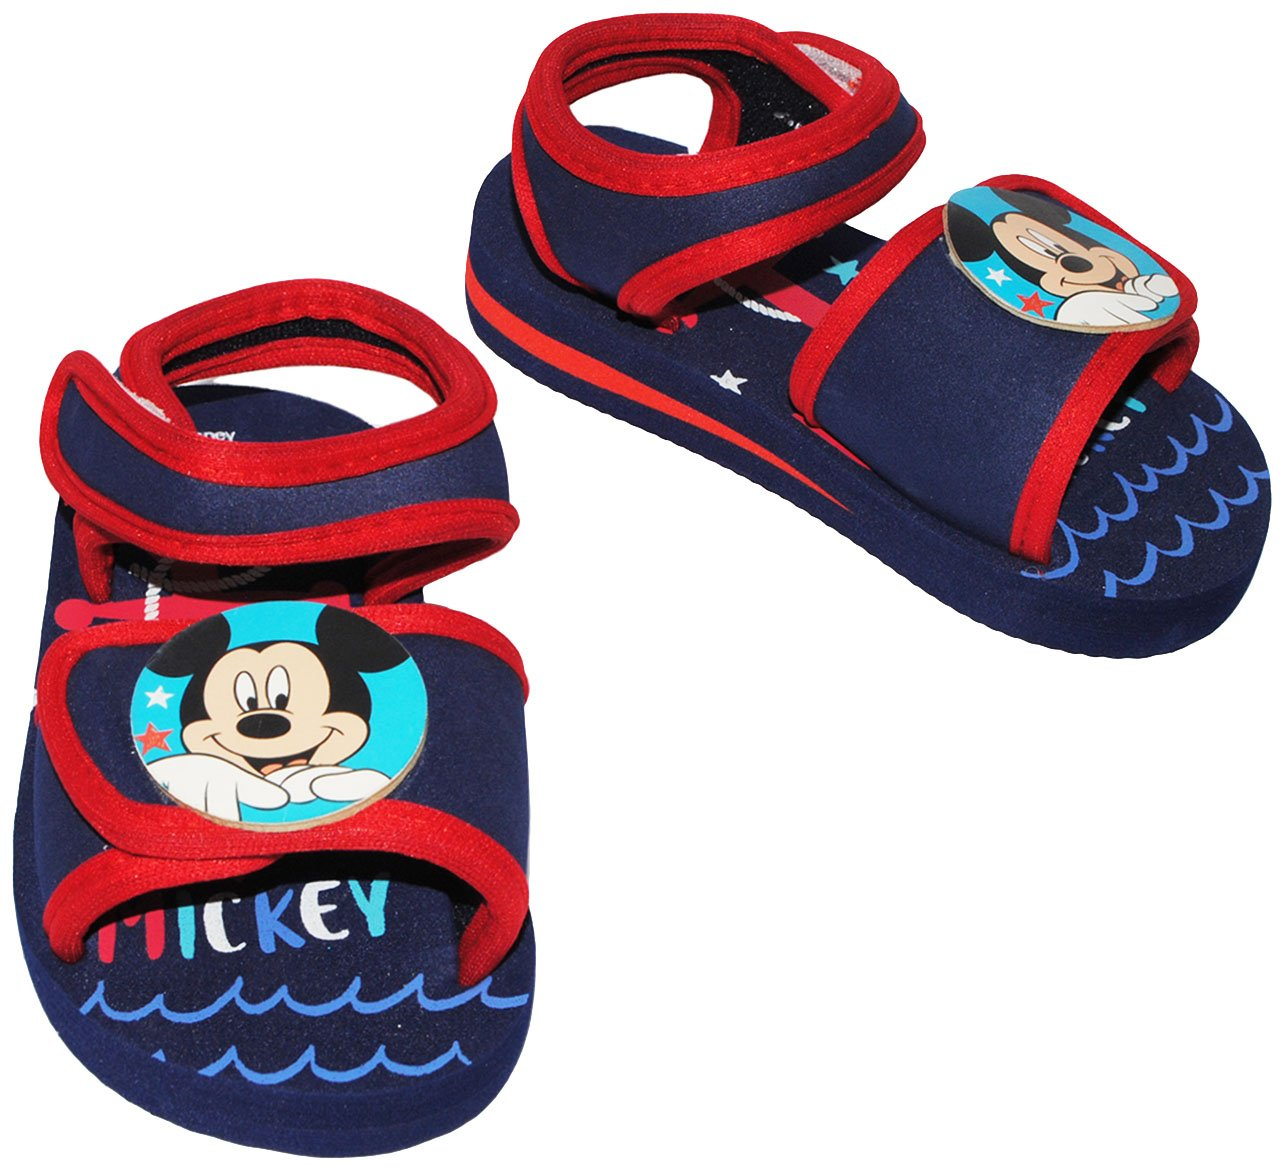 alles-meine.de GmbH Badeschuhe / Sandalen - Gr. 26 / 27 -  Disney Mickey Mouse - mit Klettverschluss / Fersen Riemchen - Riemchensandalen - Rutschfeste Schuhe Schuh / mit Prof..